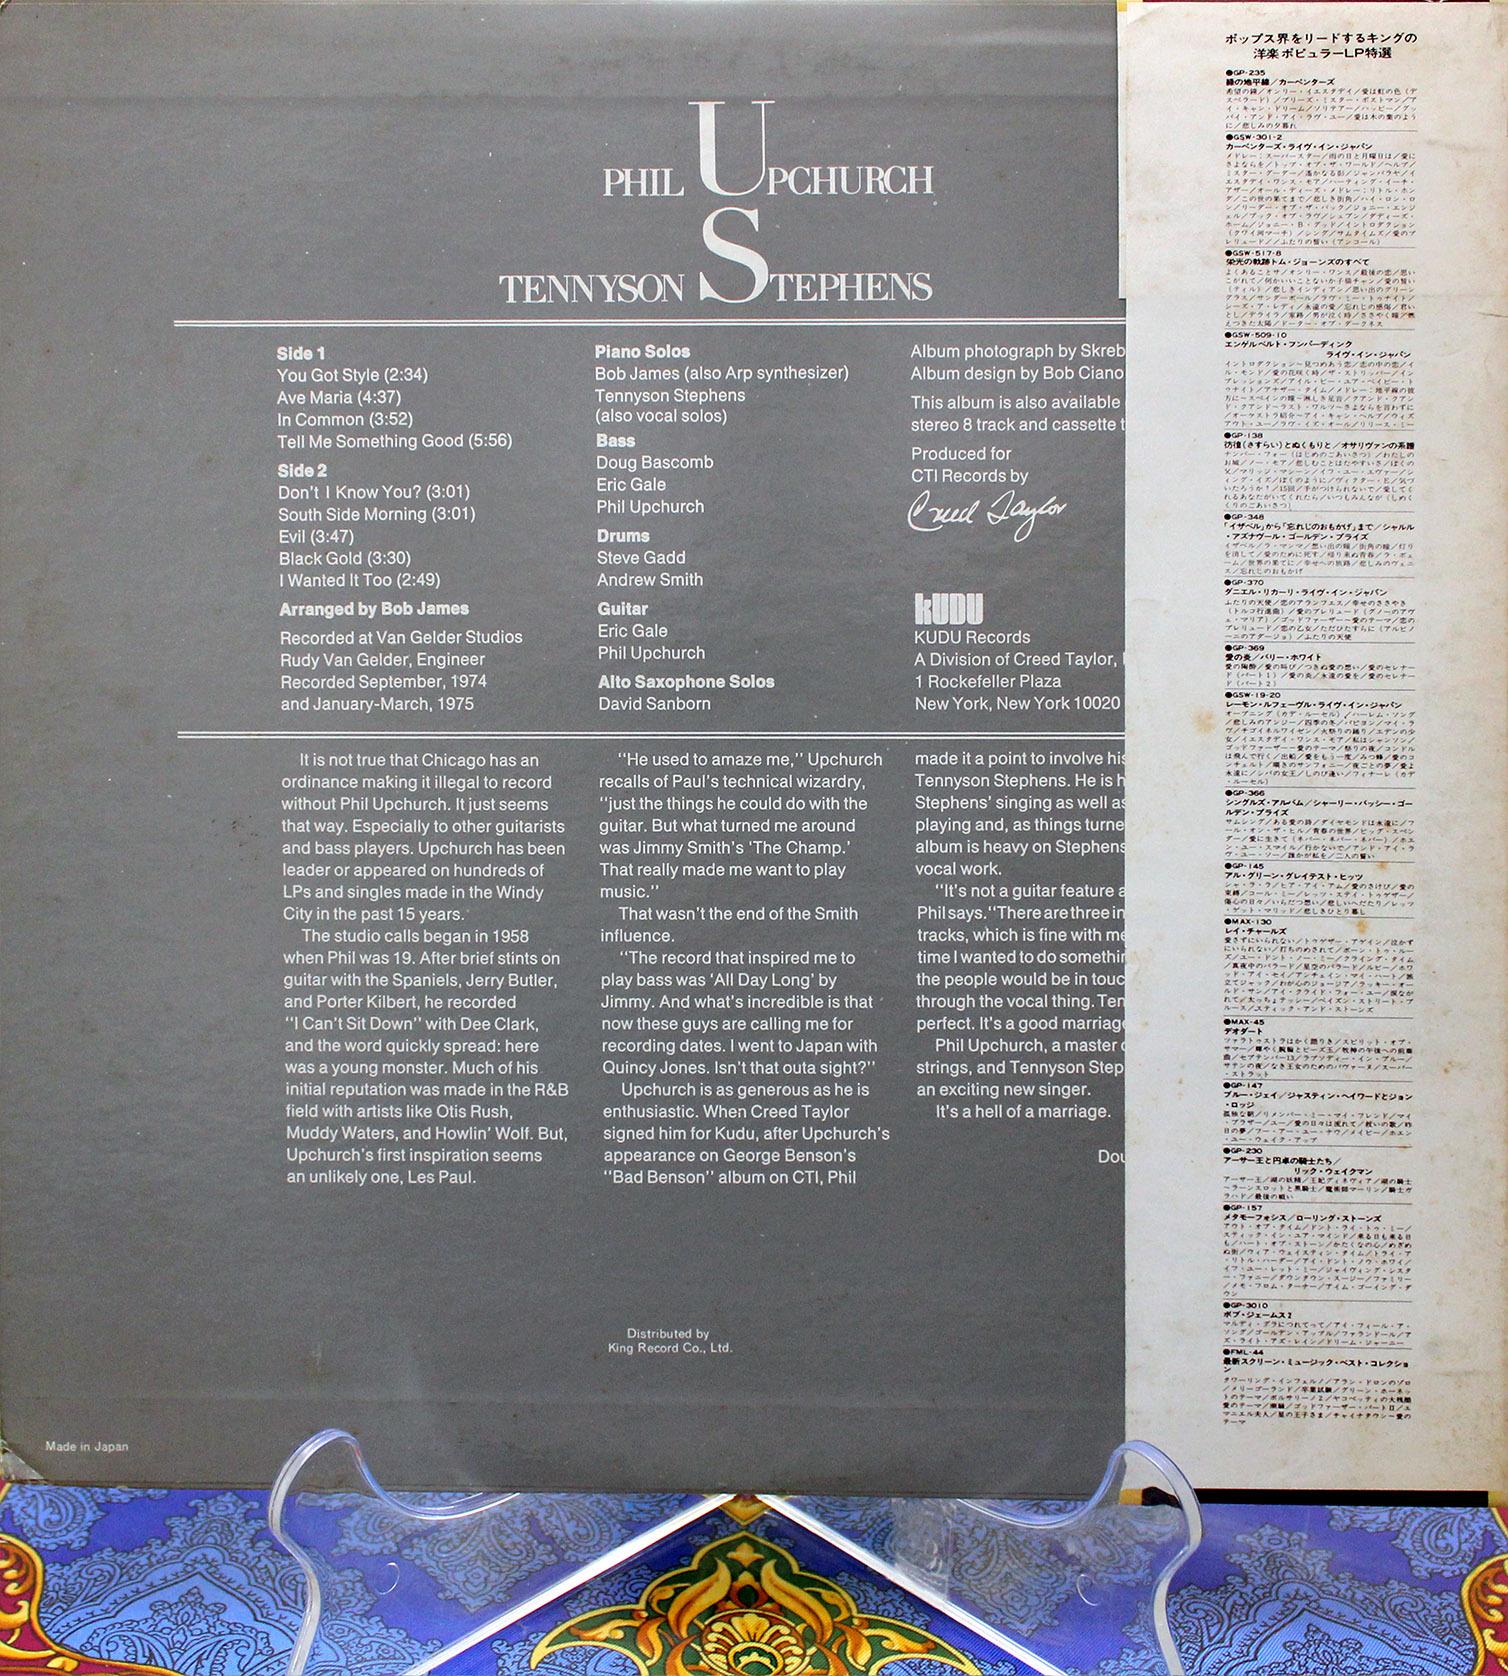 Phil Upchurch Tennyson Stephens 02